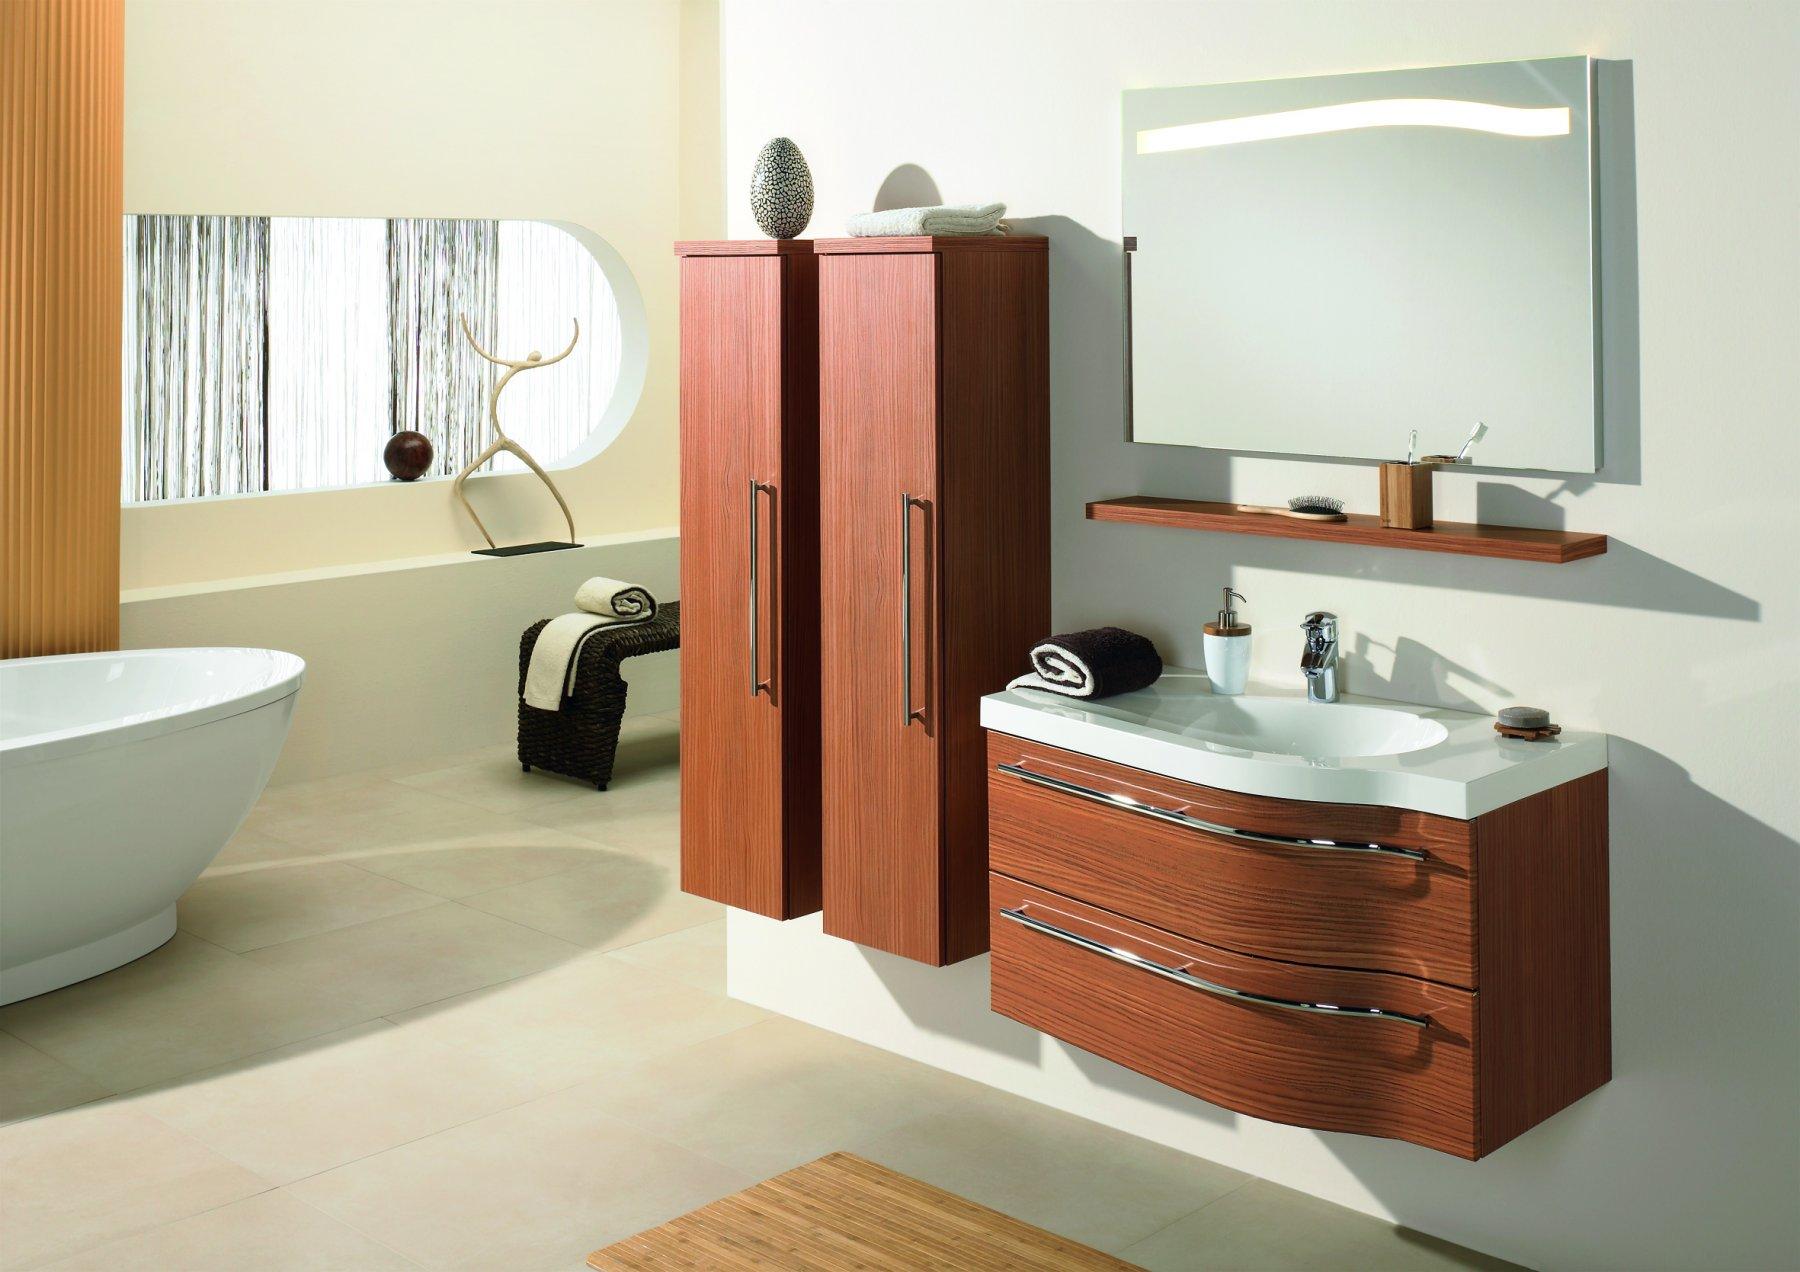 hochschrank swing badschrank g nstig arcom center. Black Bedroom Furniture Sets. Home Design Ideas